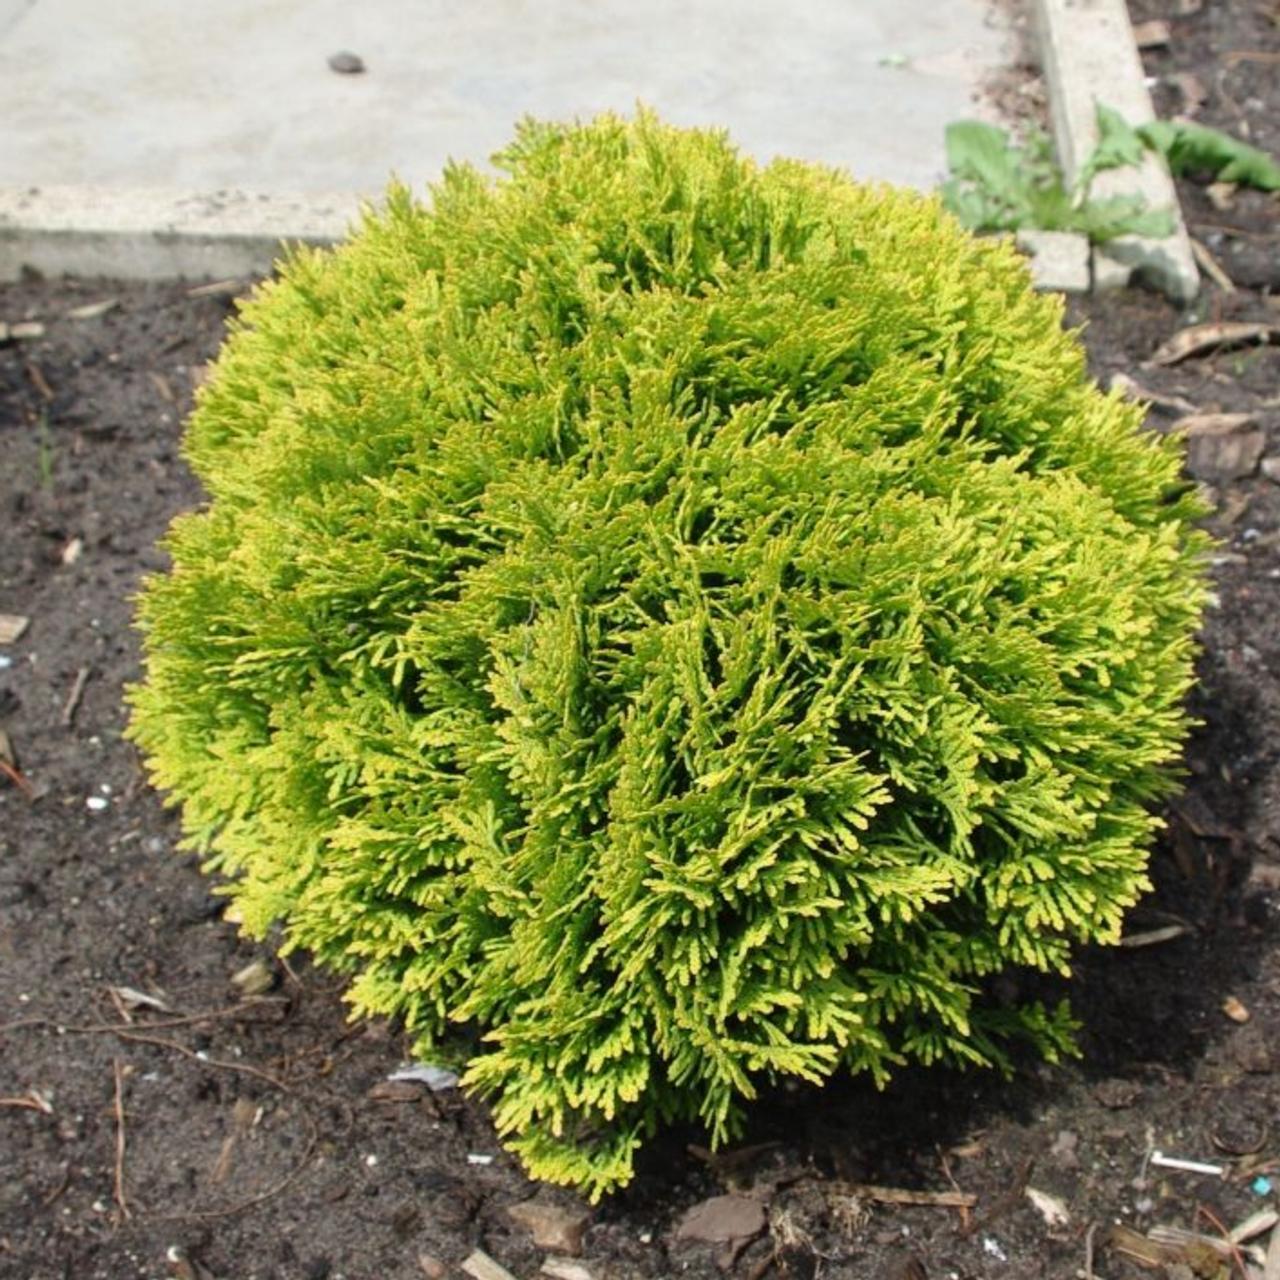 Thuja occidentalis 'Mirjam' plant